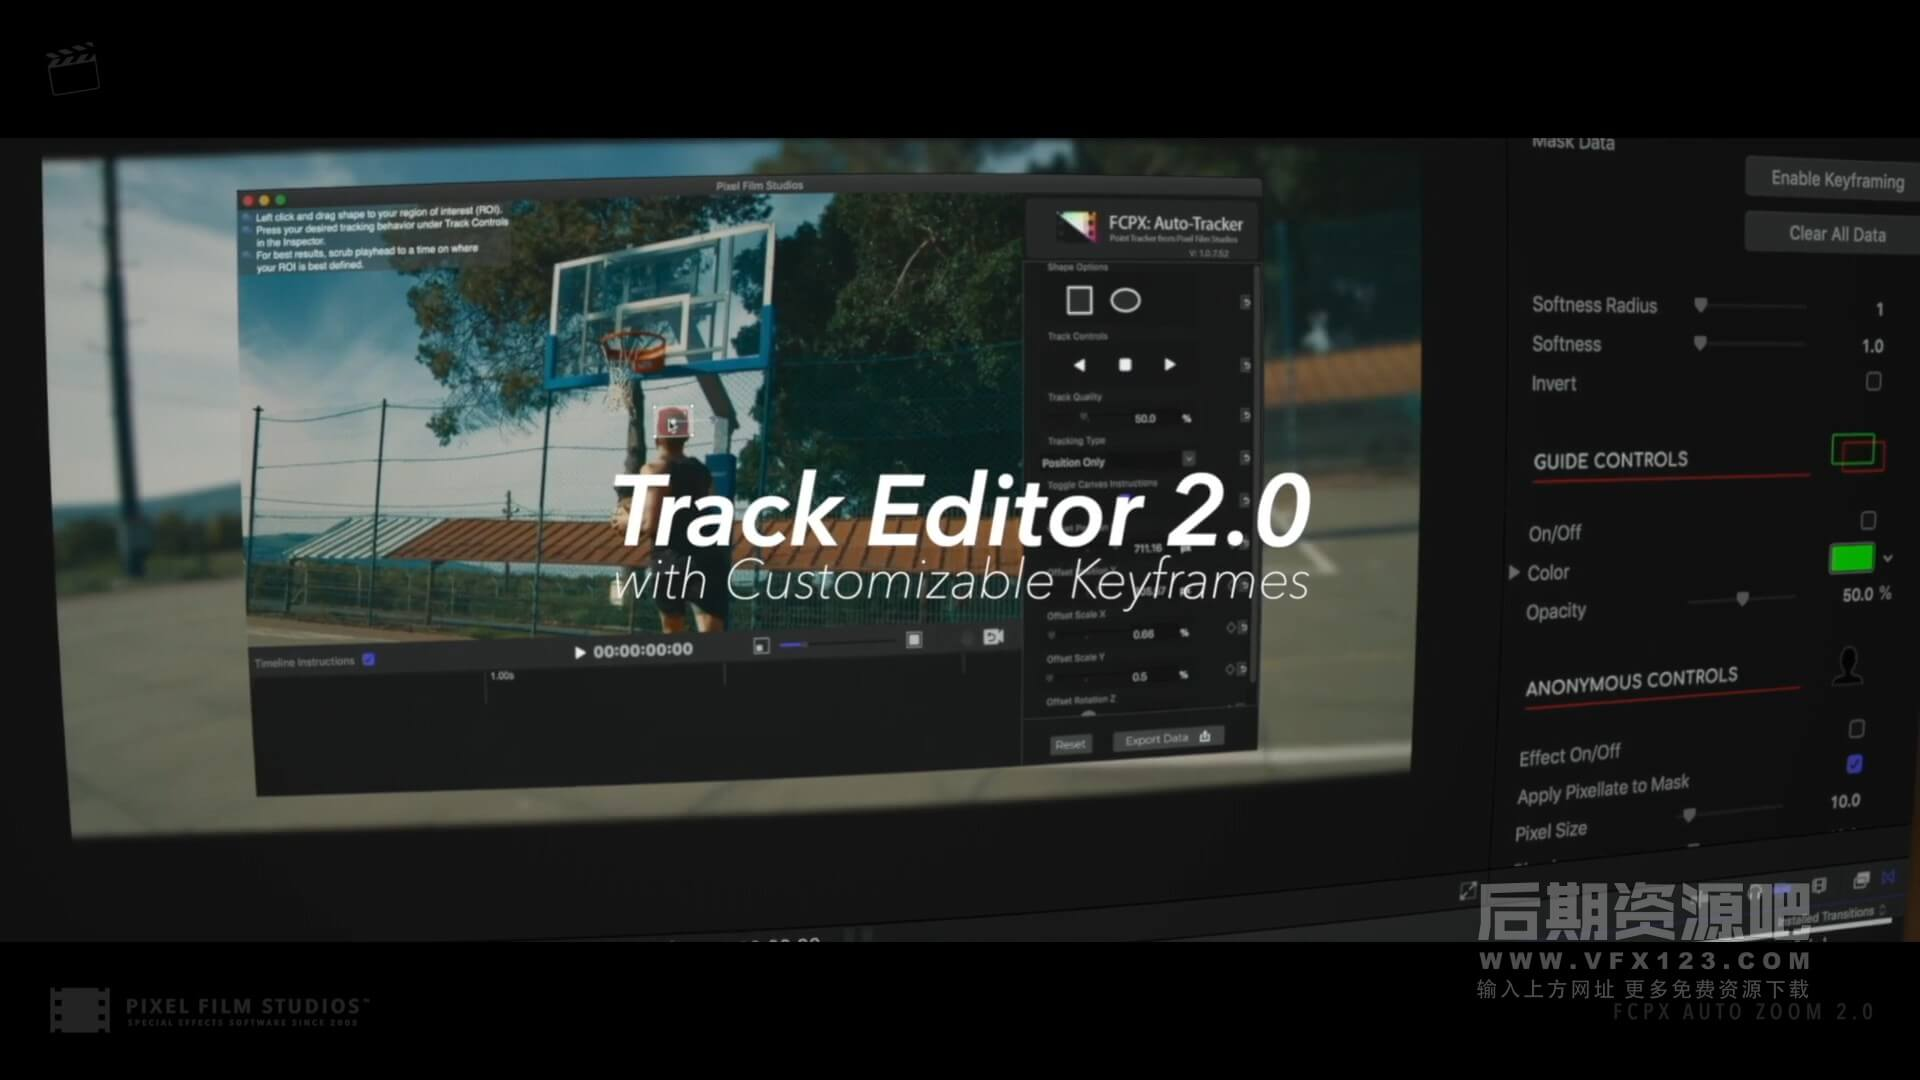 fcpx插件 专业自动跟踪缩放工具 画面添加变焦抖动缩放运动模糊效果 Auto Zoom 2.1